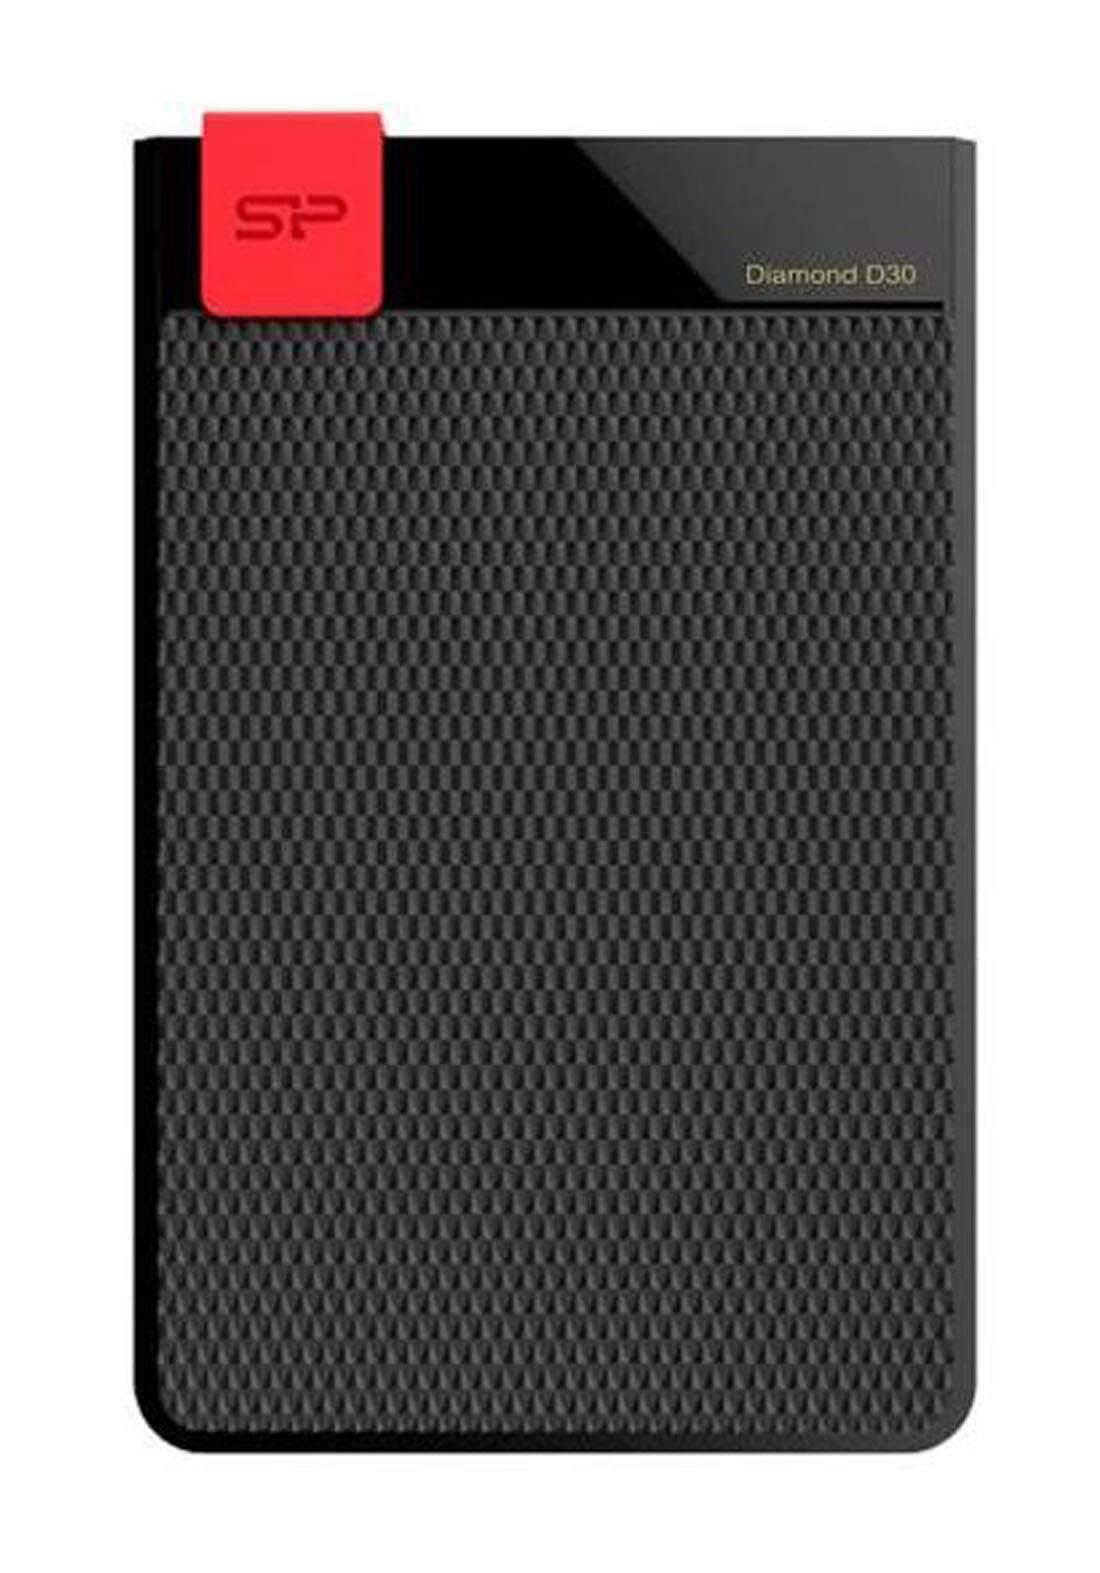 Silicon Power Diamond D30 1TB Portable Hard Drive - Black هارد خارجي